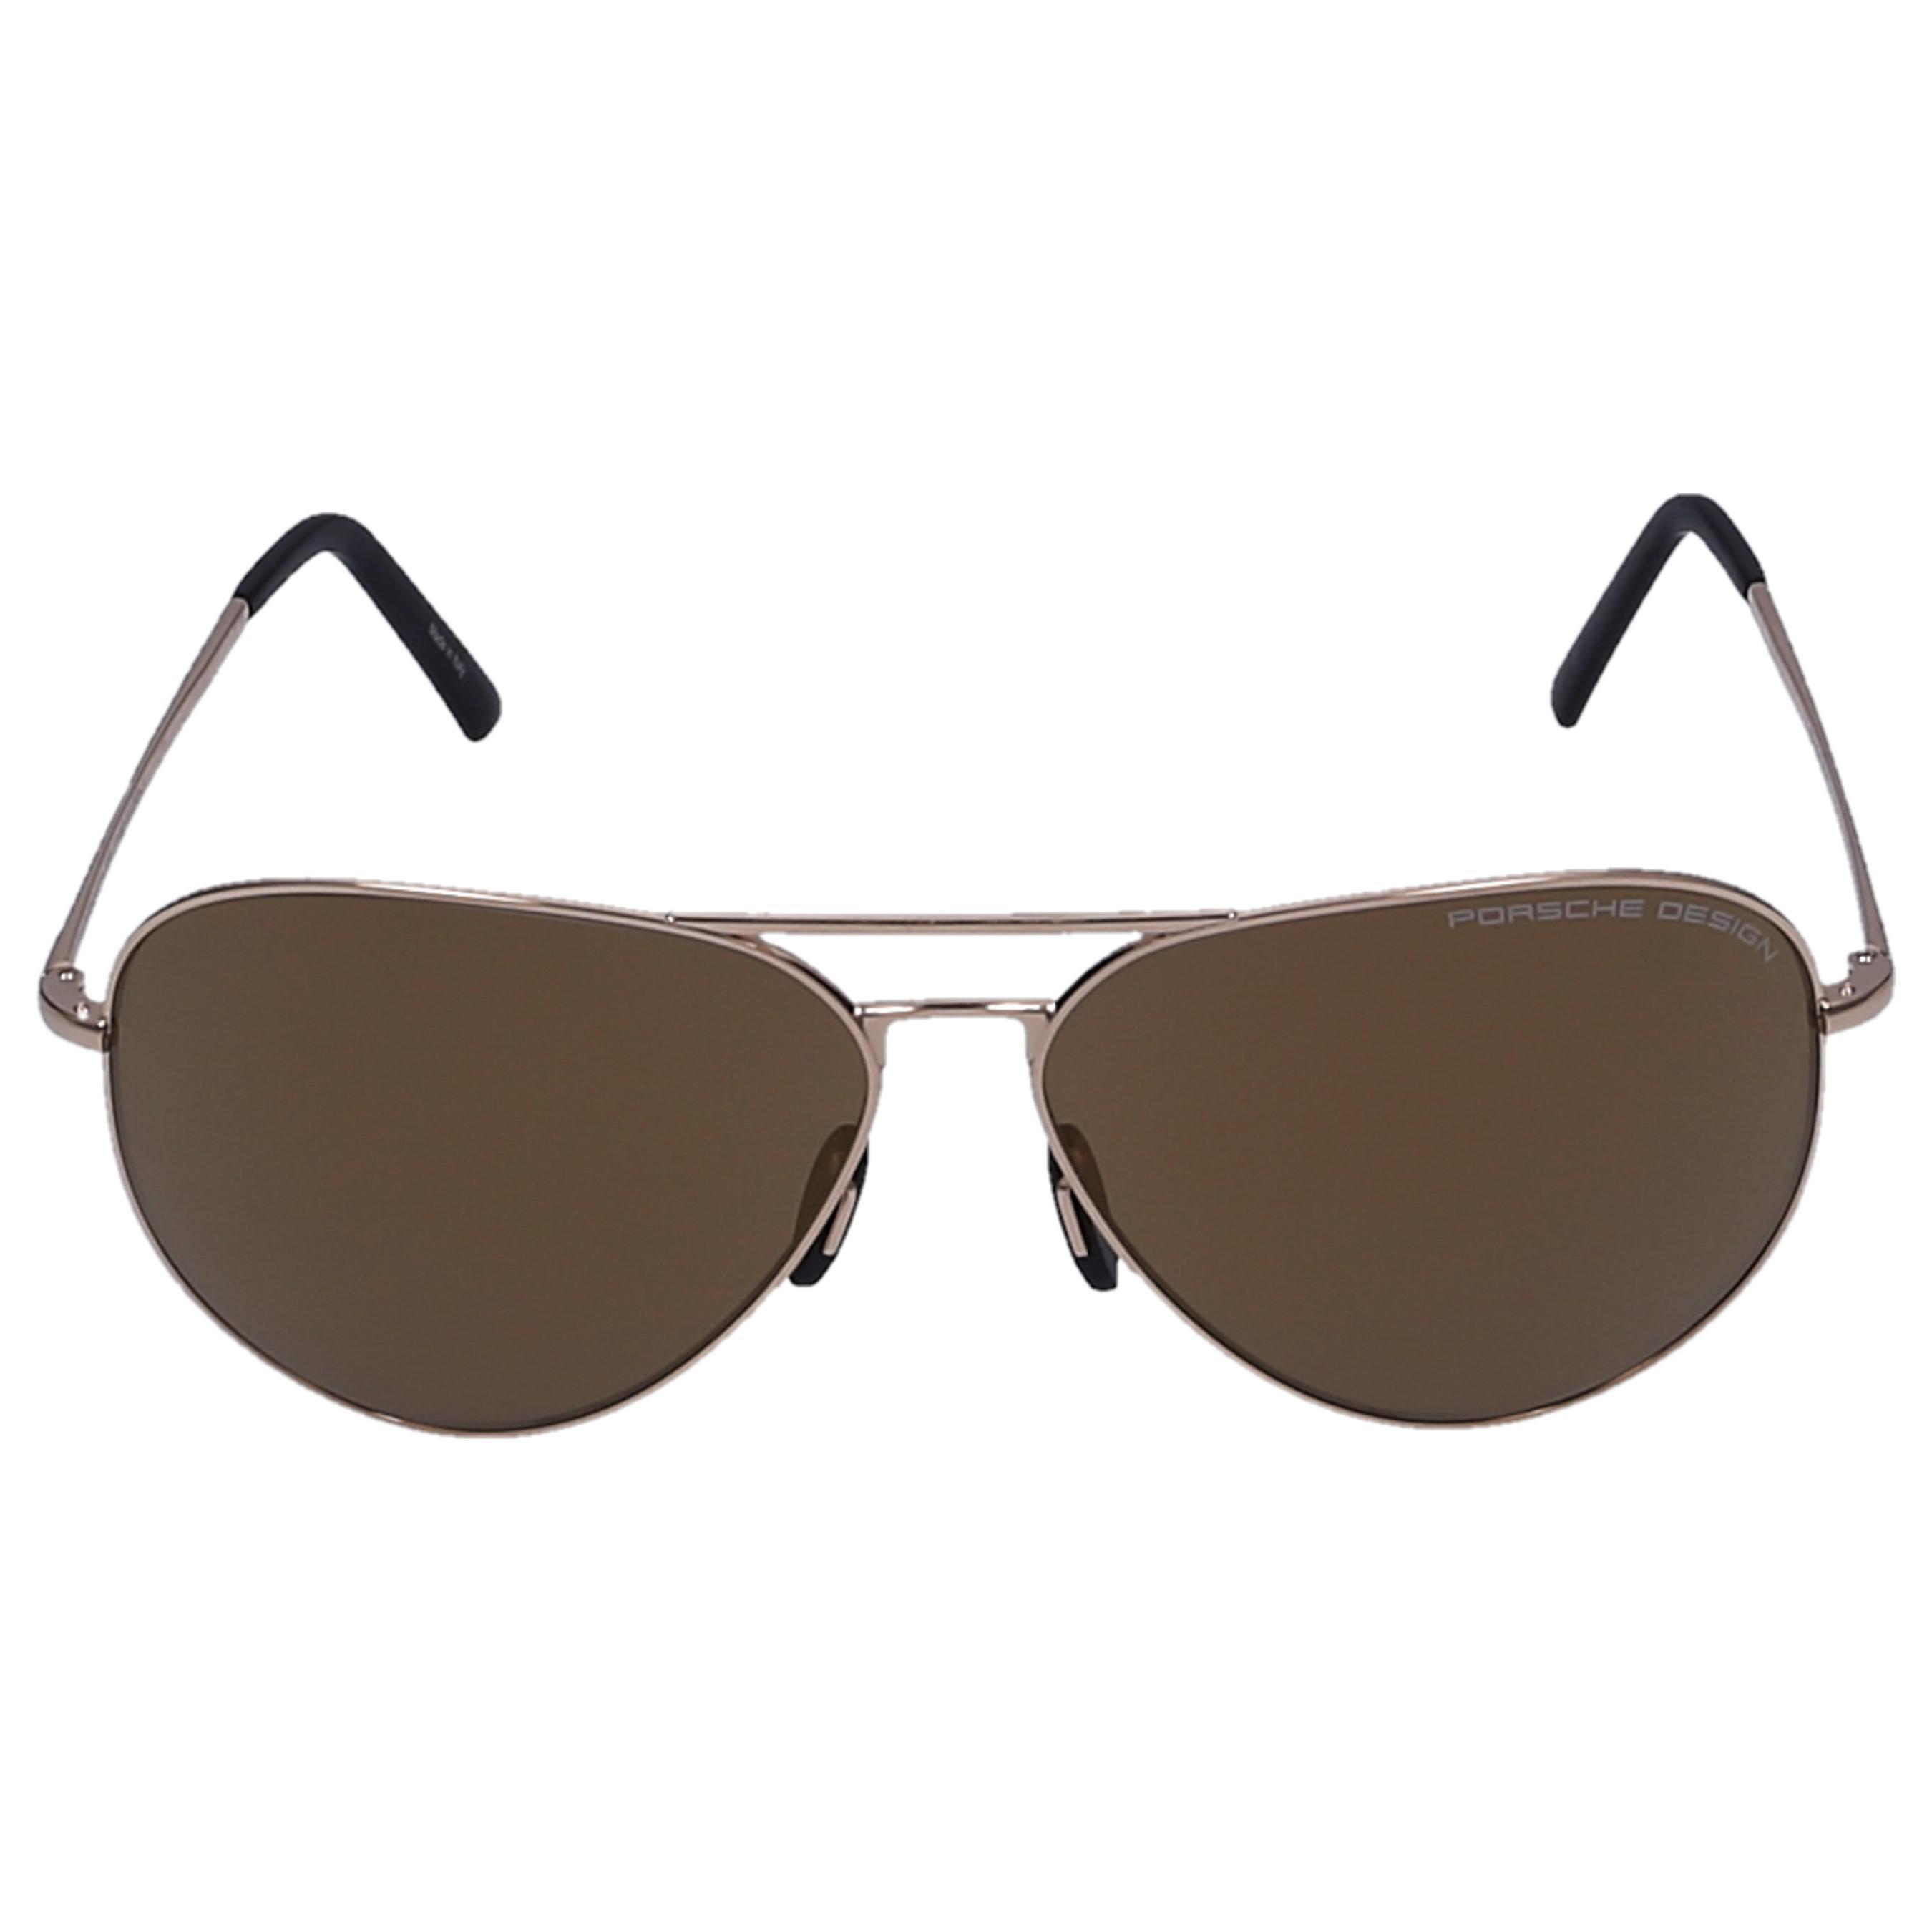 dfefaea595f Lyst - Porsche Design Men Sunglasses Aviator 8508 Metal Gold in ...